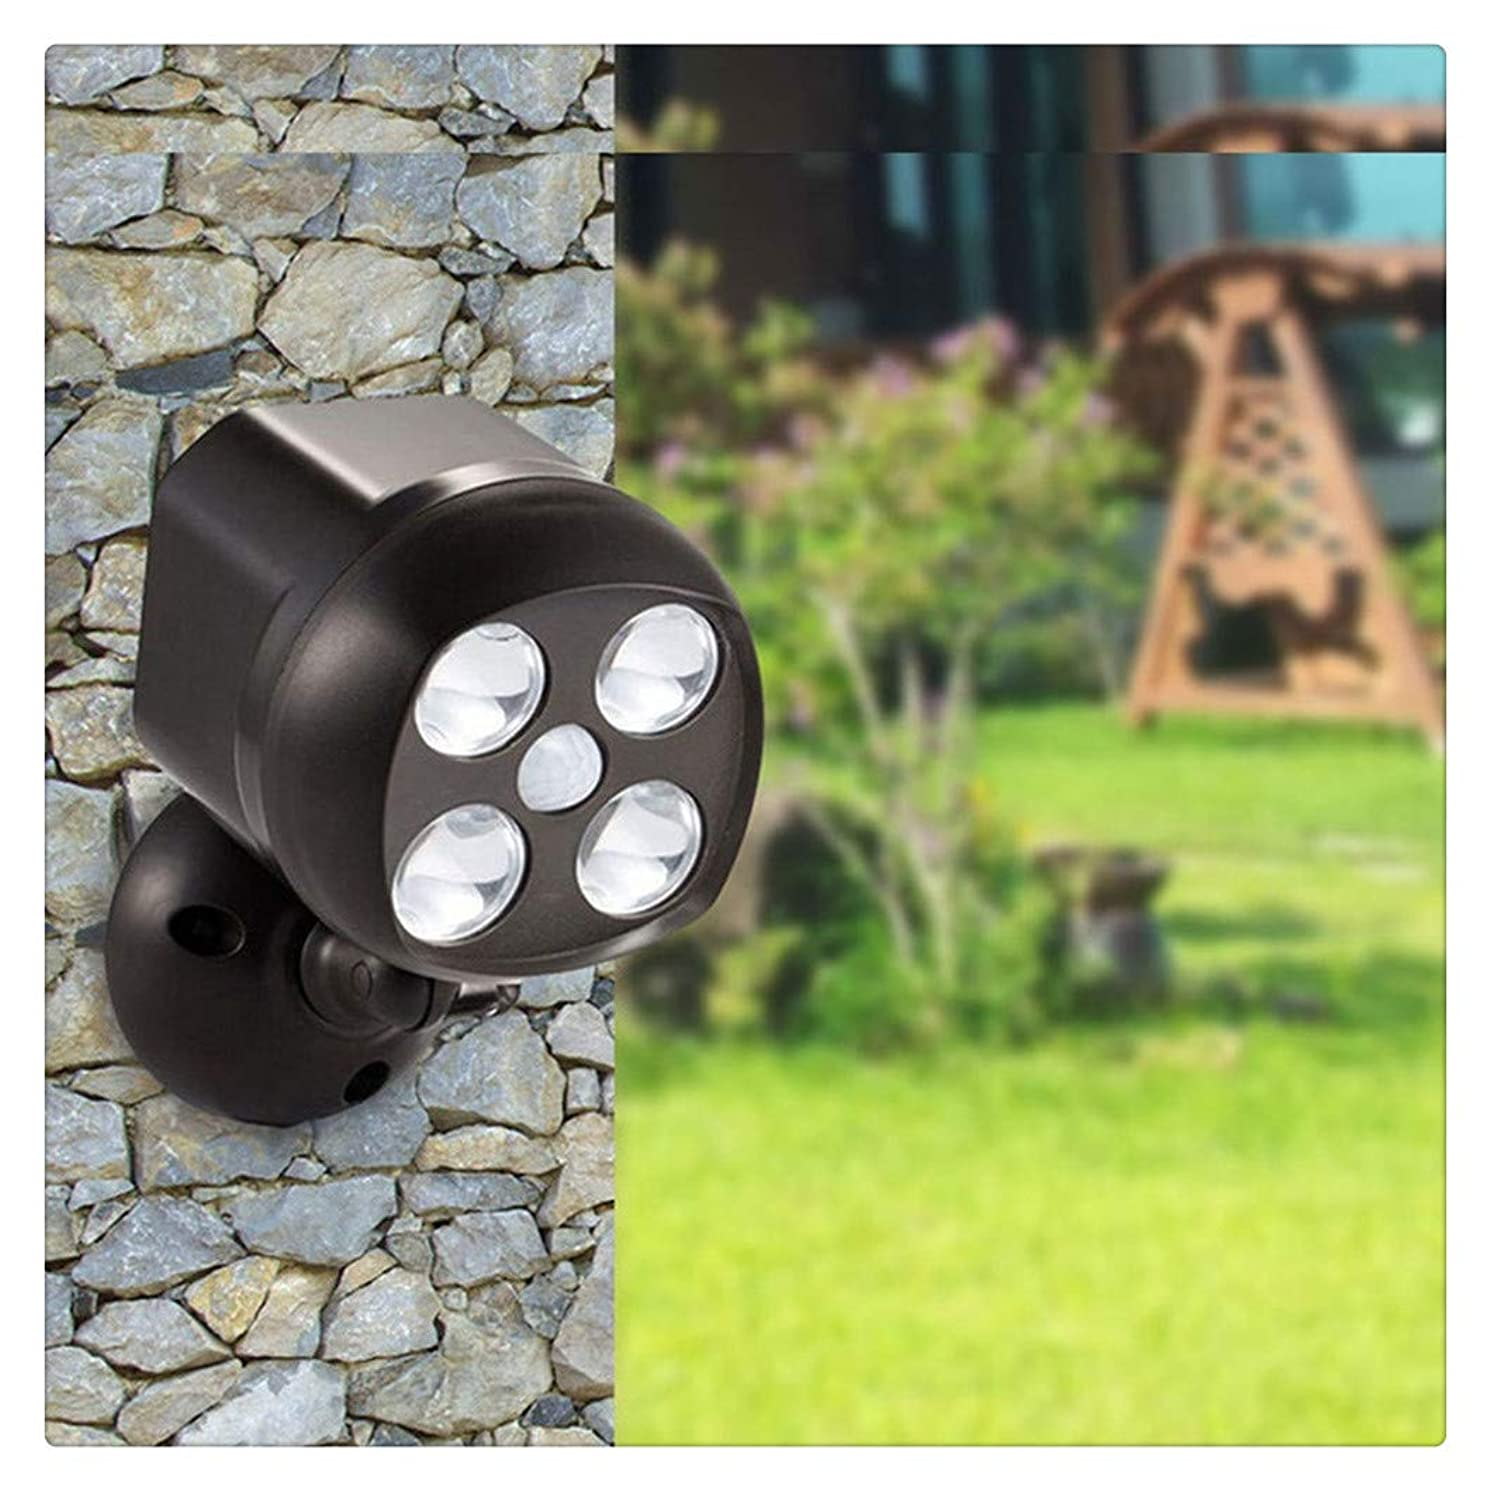 Kanzd 360° Battery Power Motion Sensor Security LED Light Garden Outdoor Indoor